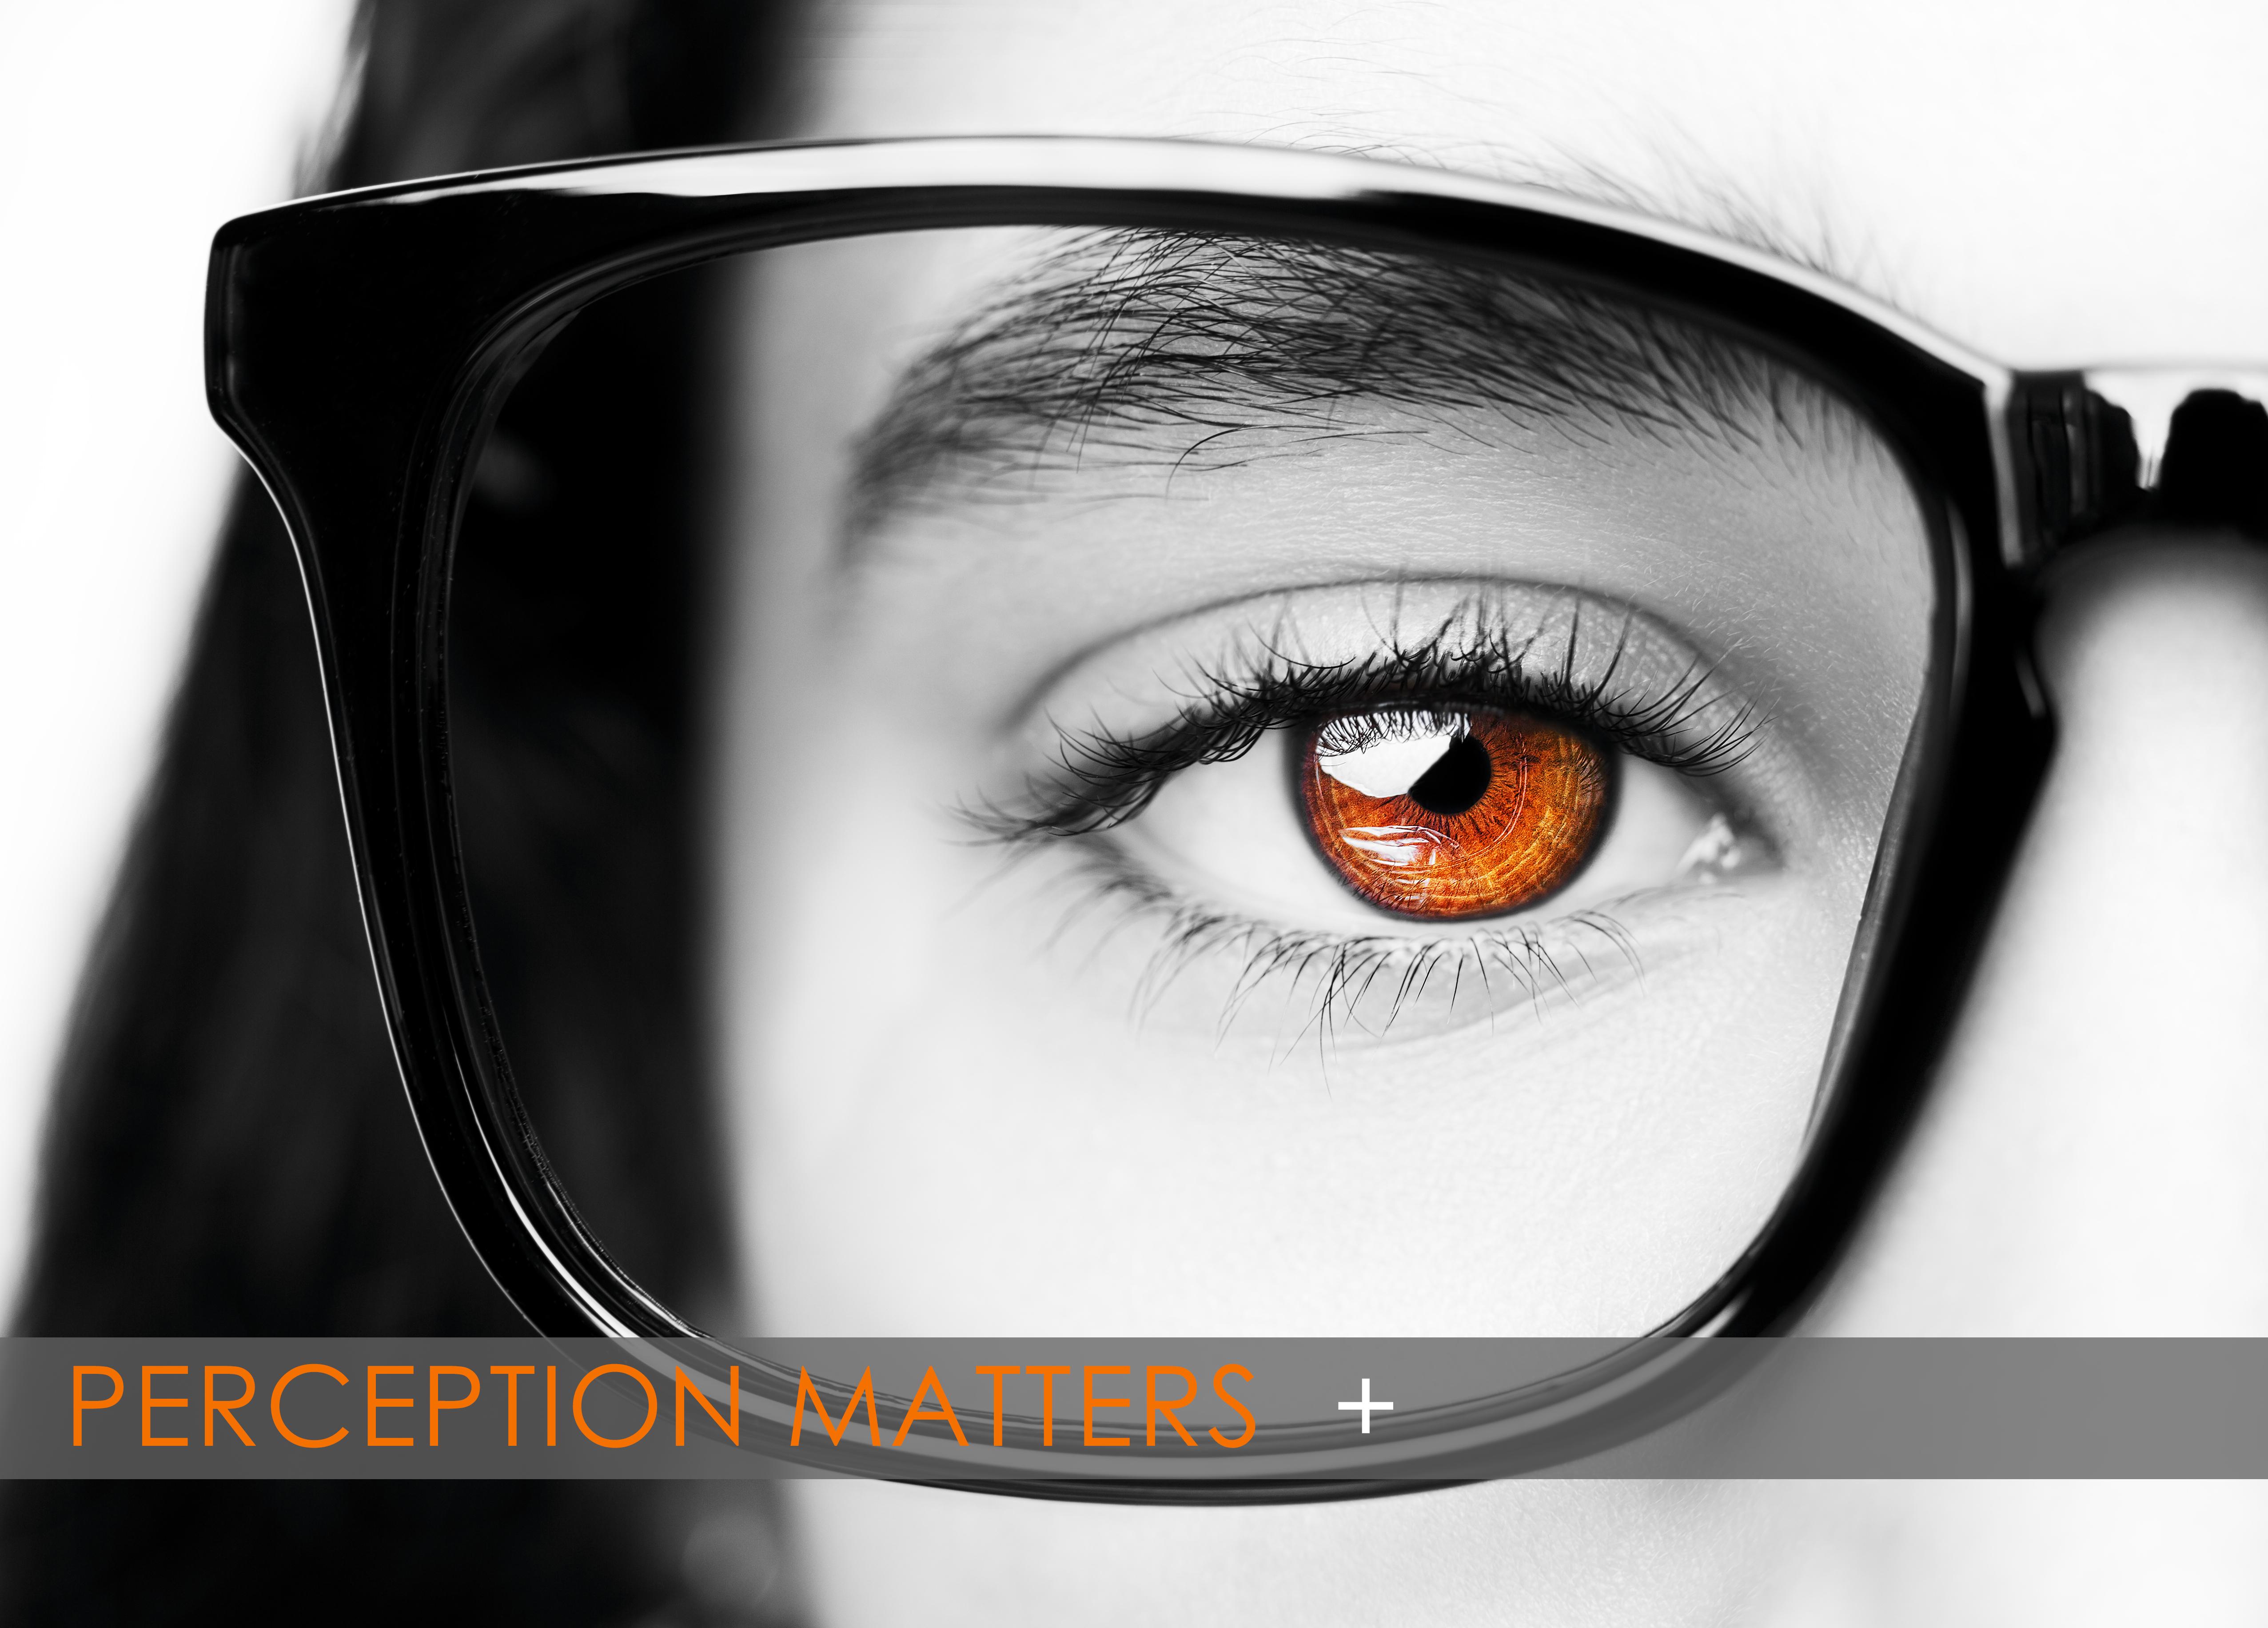 PerceptionMatters